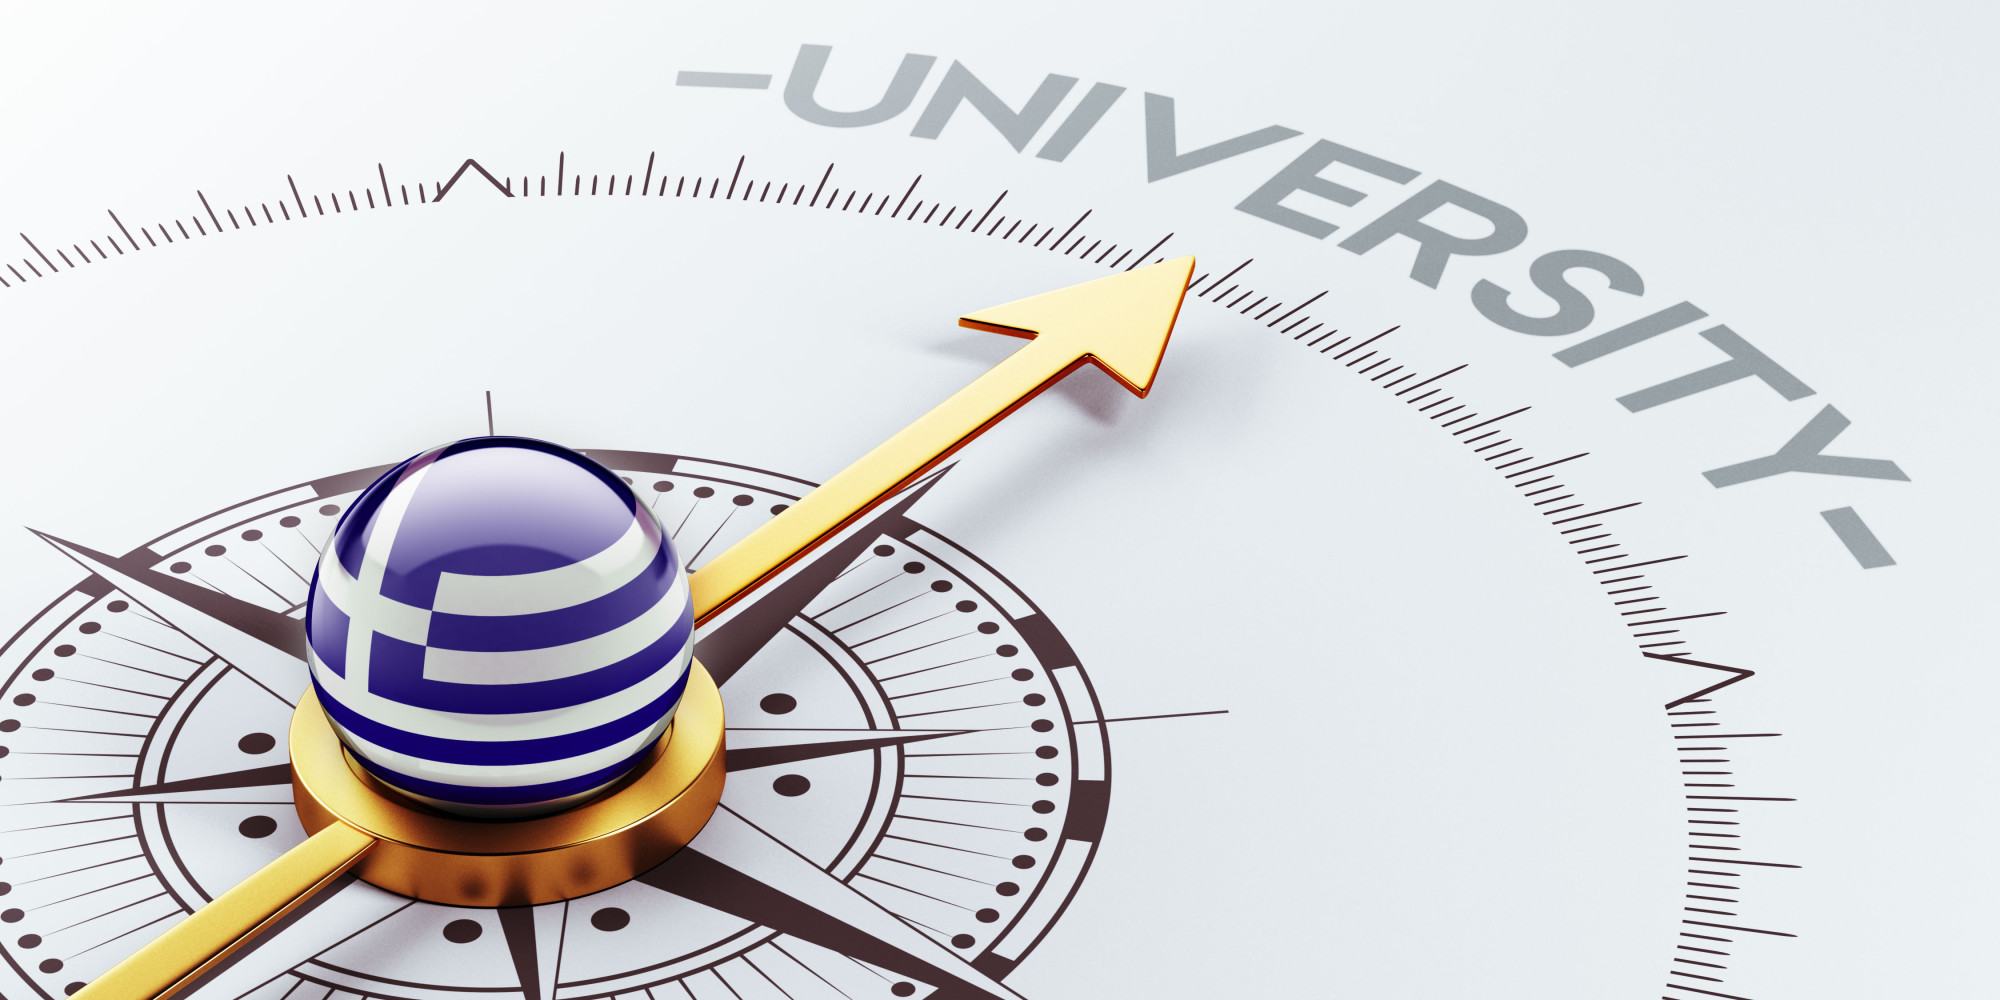 Greece University Concept